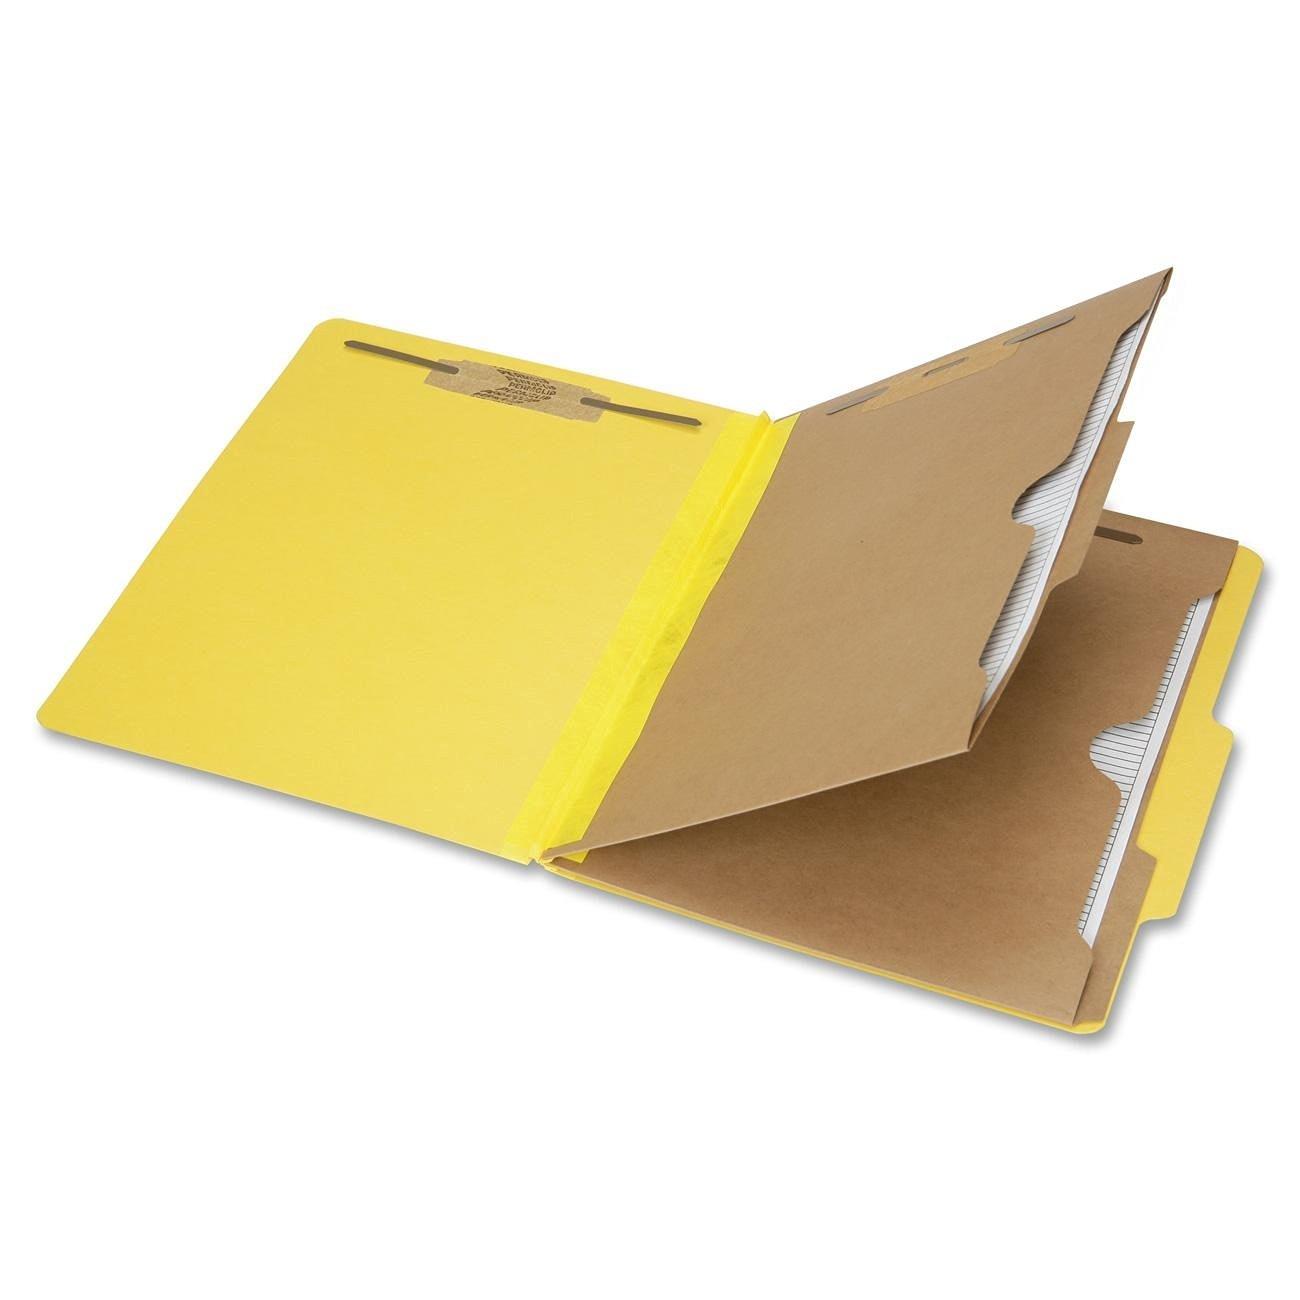 Etimoe Raw Wood Veneer Sheets  6 x 27 inches 1//42nd                 7711-10